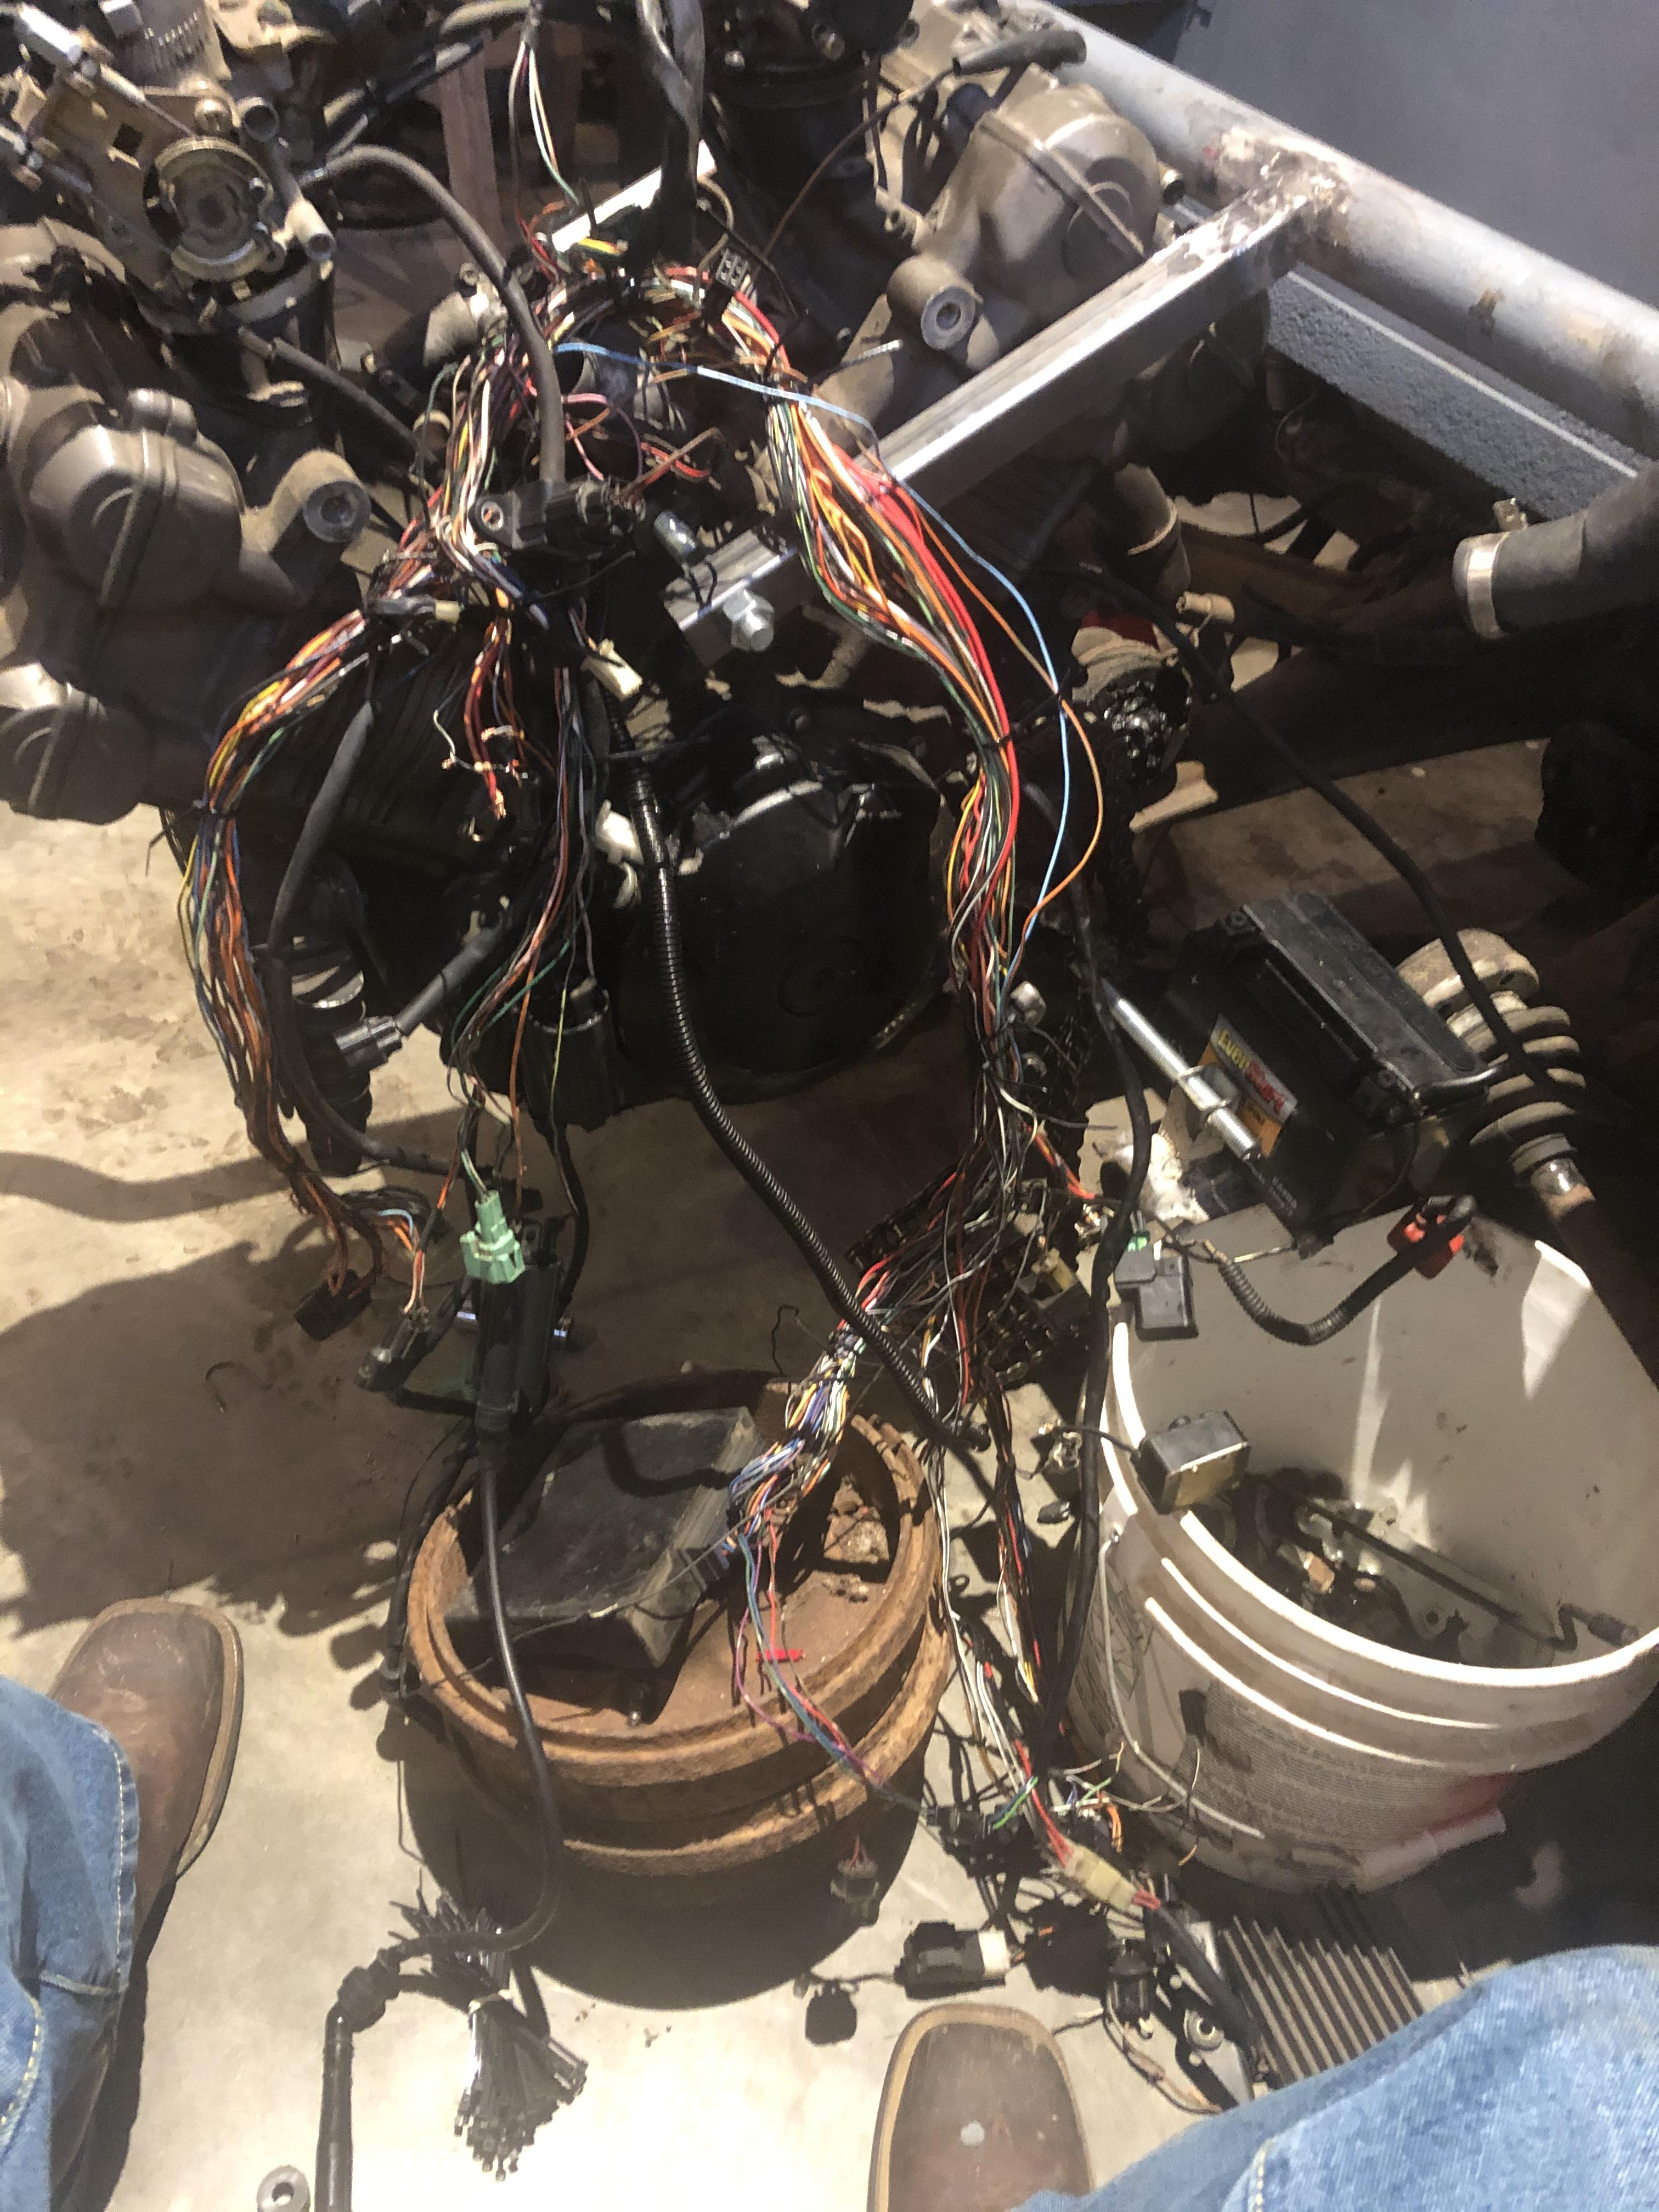 2001 tl1000s wiring issue on engine swap-27717caf-f19c-4a3d-855c-3acf921caf3a_1575232811313.jpeg